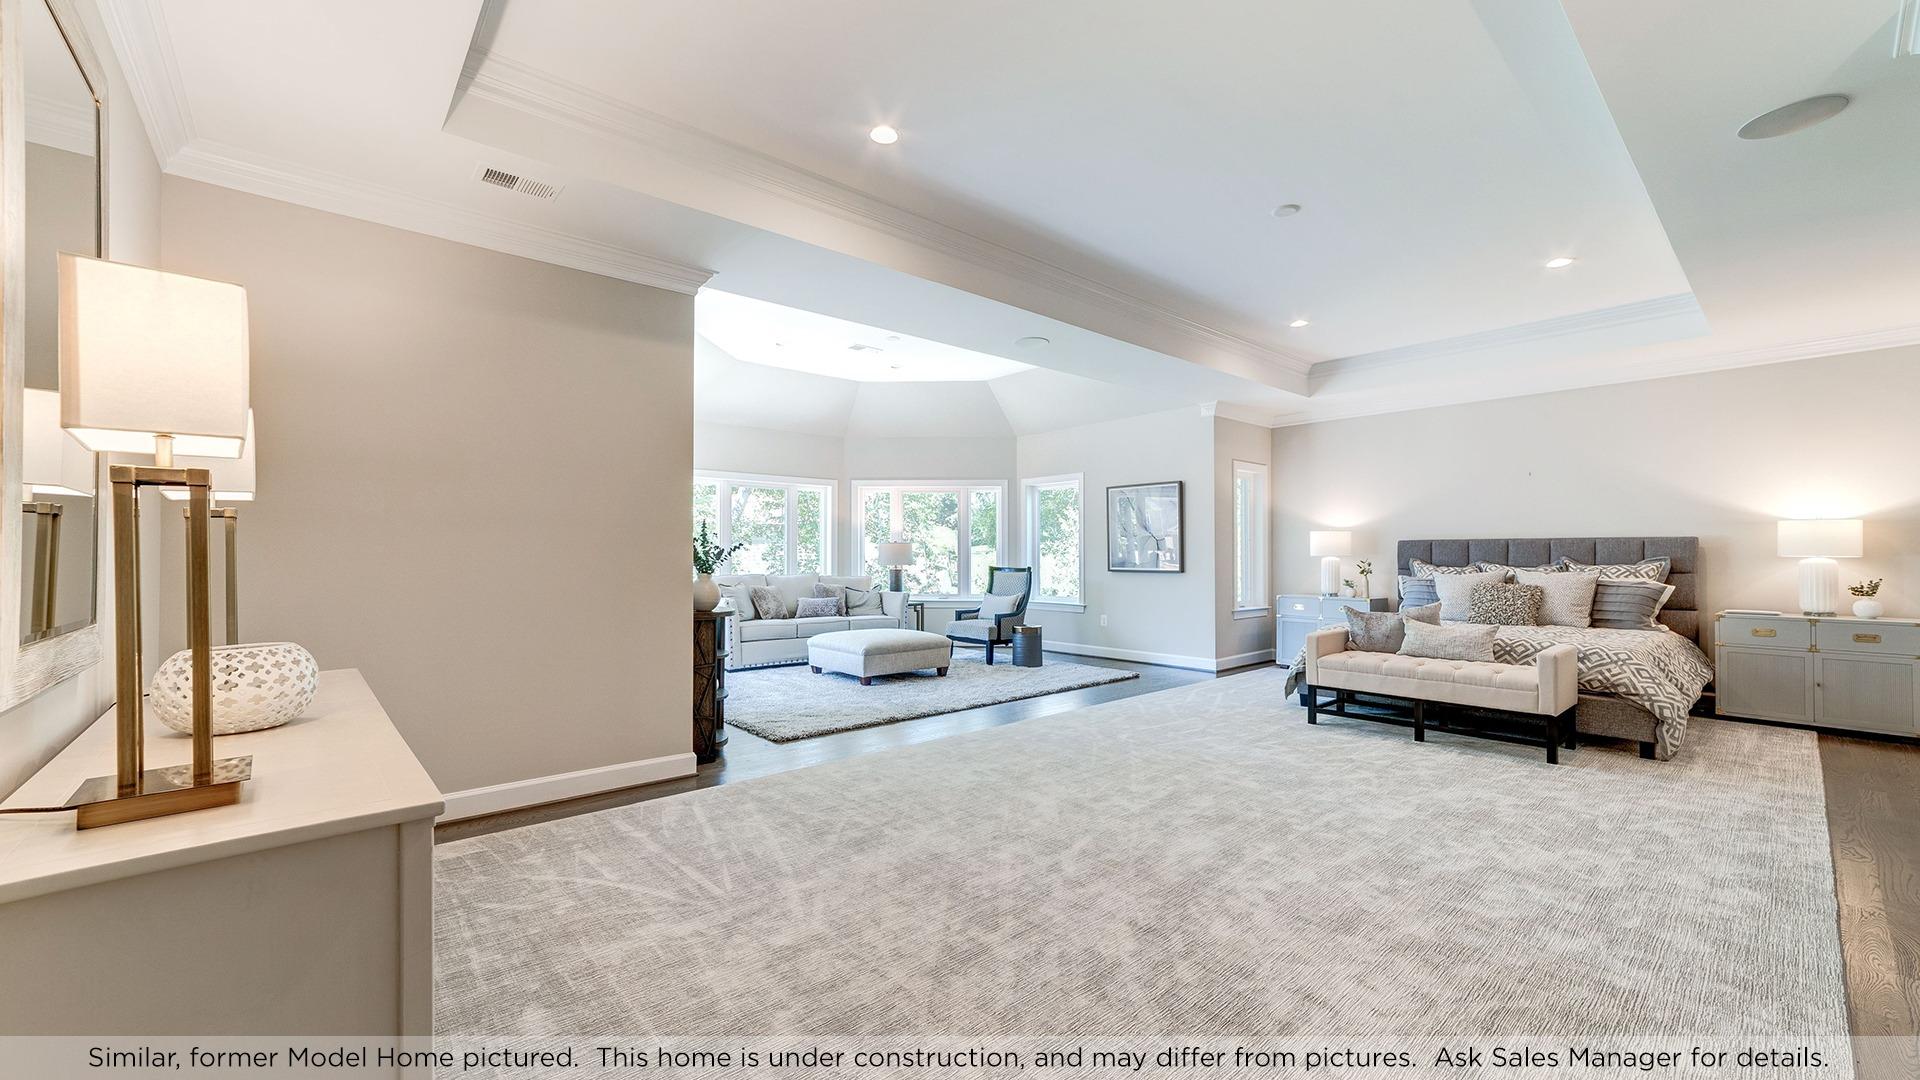 Owner's Bedroom, similar Model Home